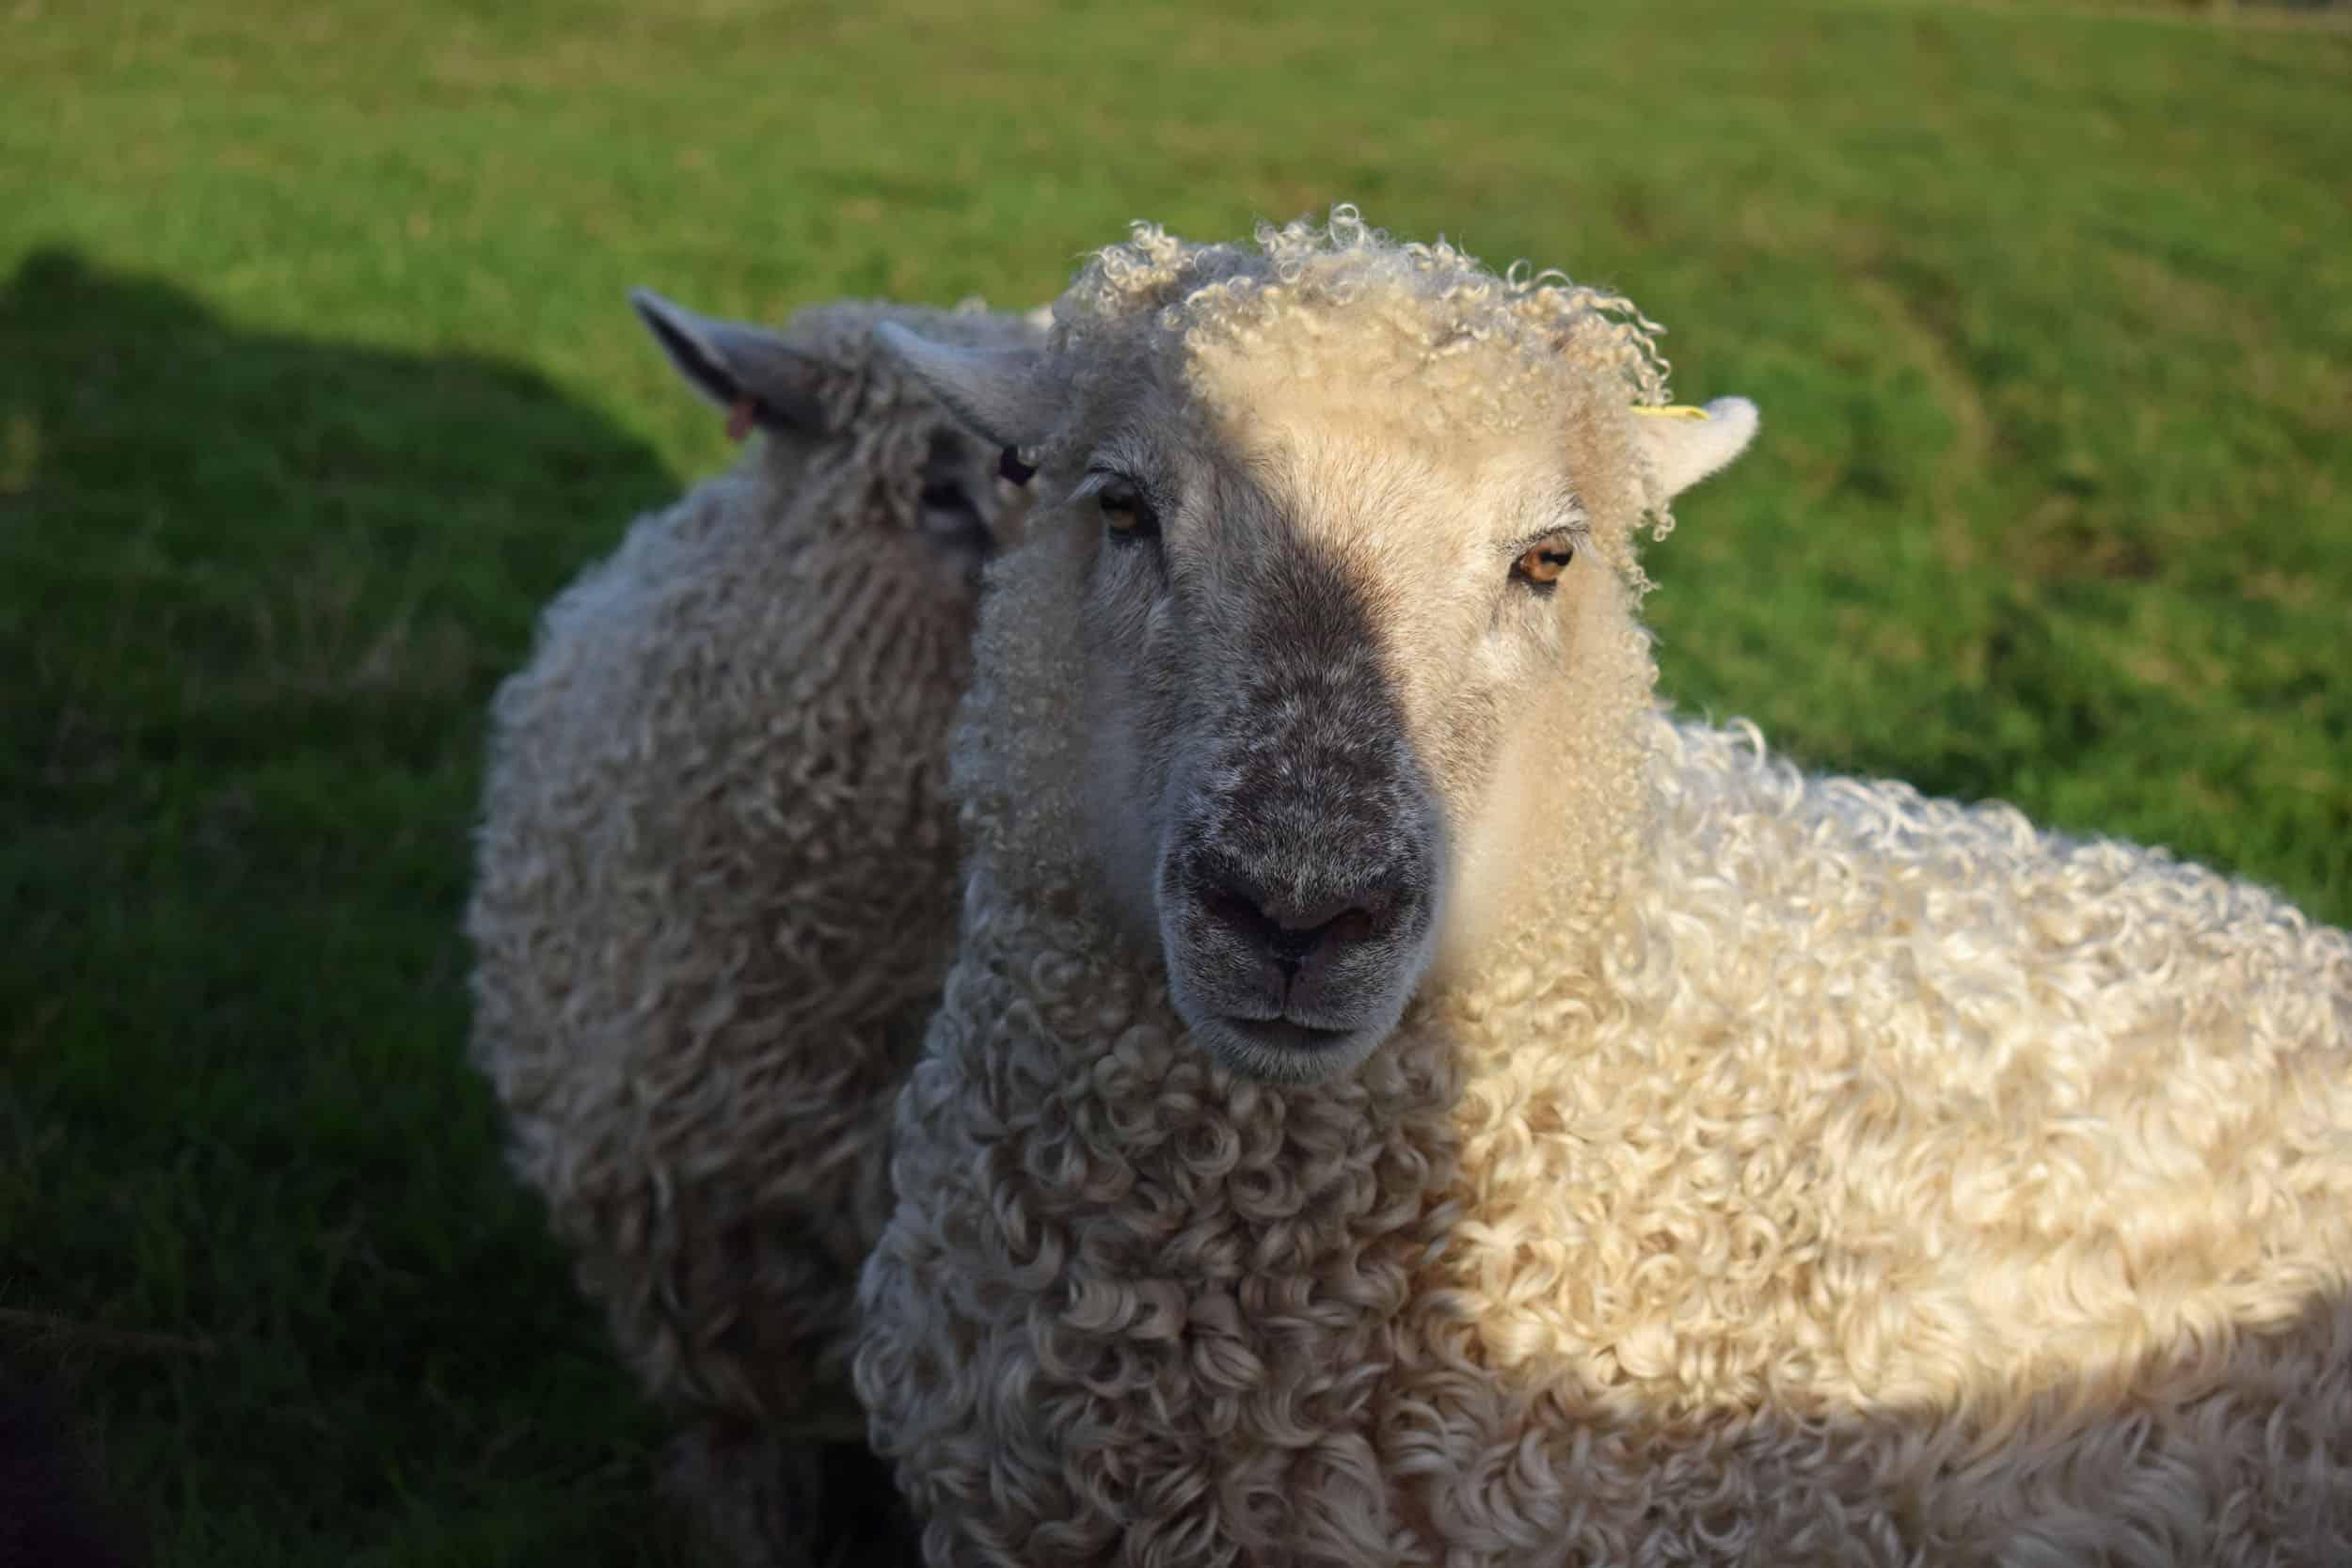 Porridge gotland cross greyface dartmoor sheep longwool patchwork curls white wool